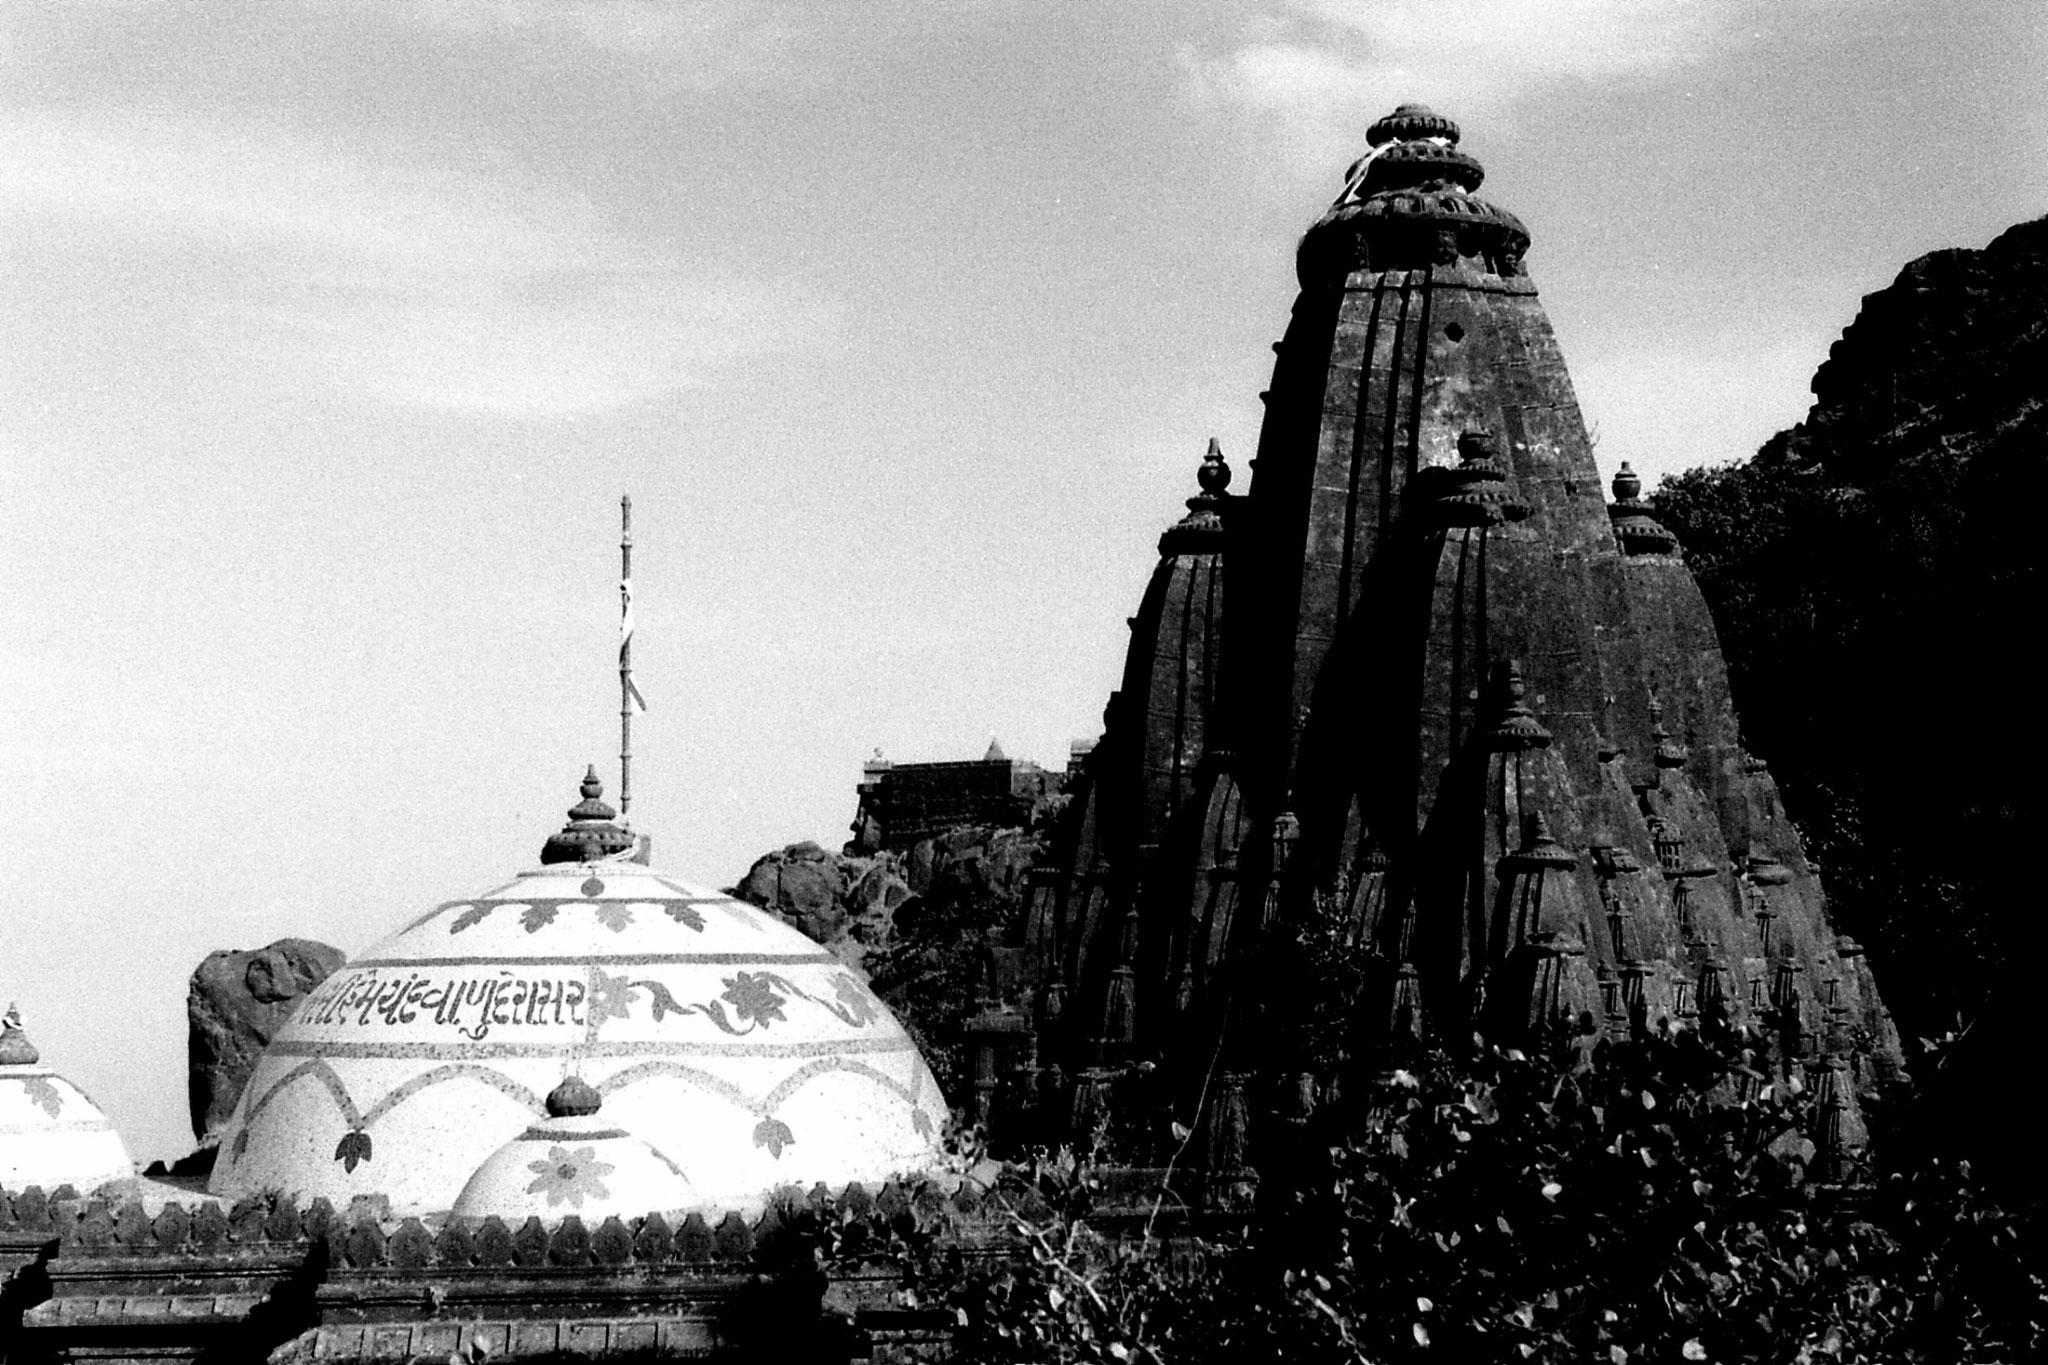 12/12/1989: 28: Junagardh, temples